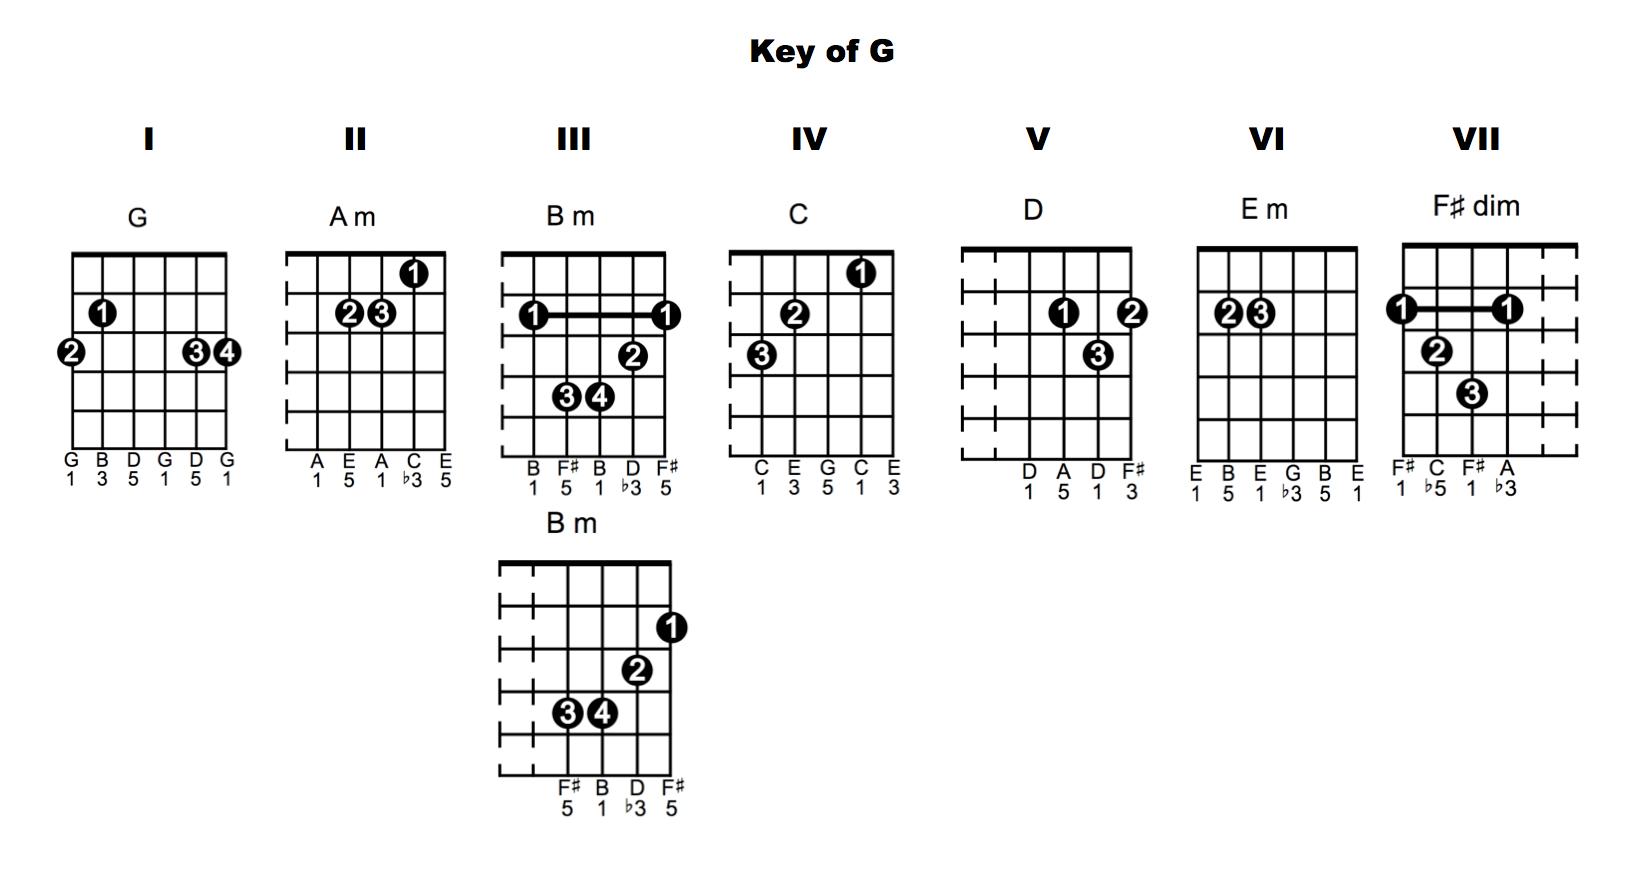 Guitar chords in key of g